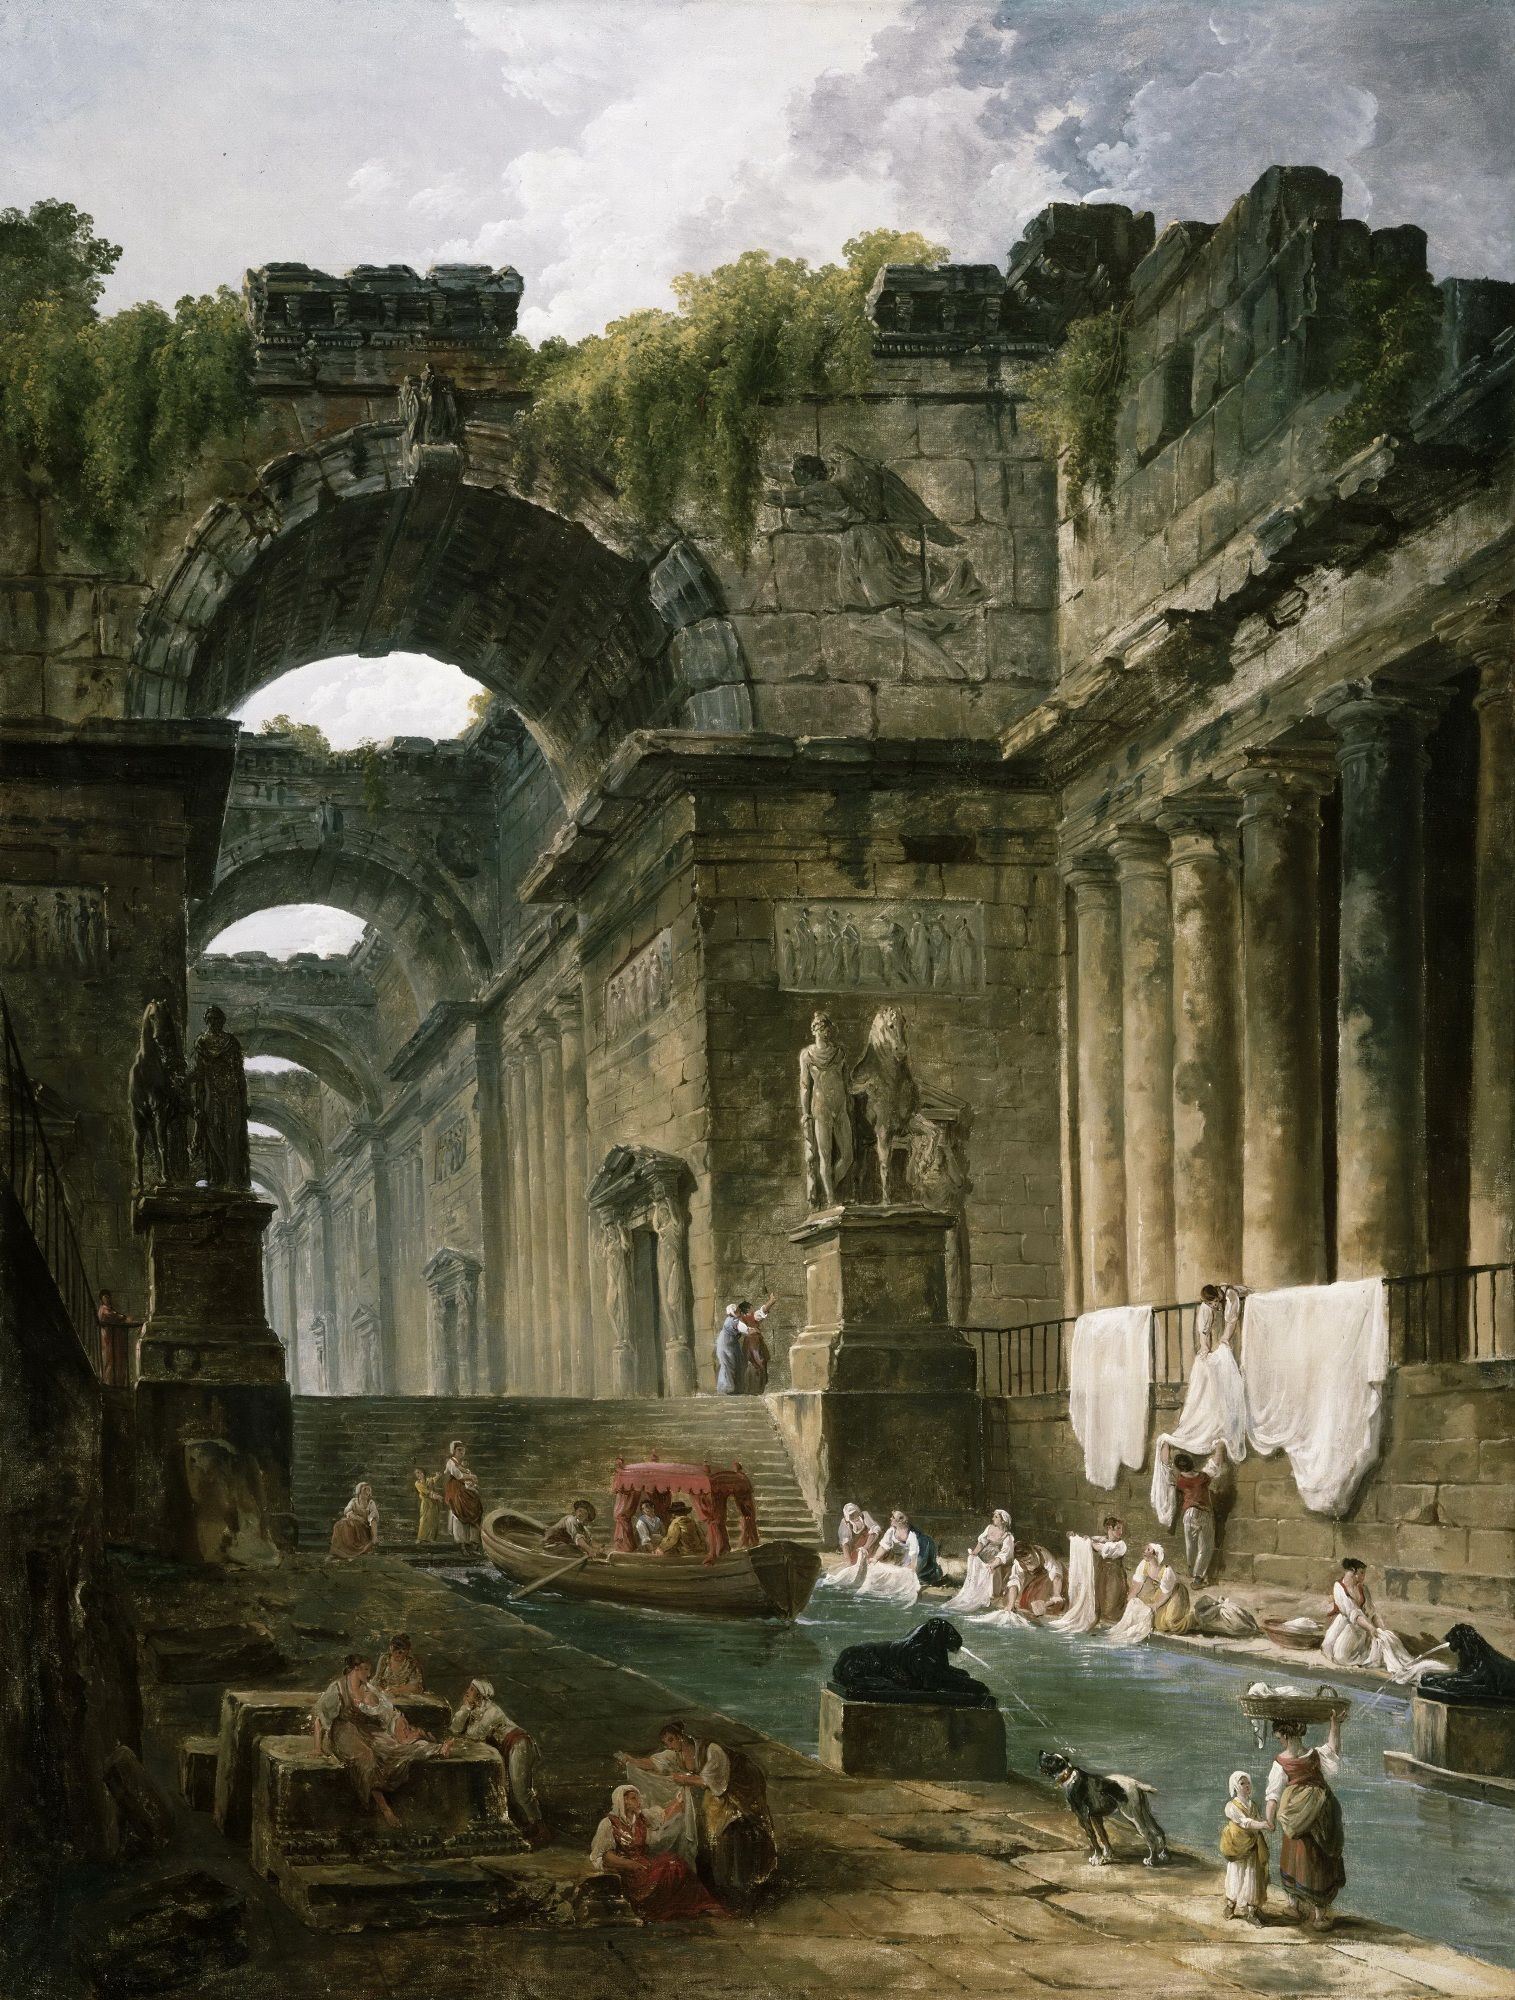 ANCIENT ROMAN BATH BATHS PAINTING ROME ITALY RUINS ART REAL CANVAS PRINT